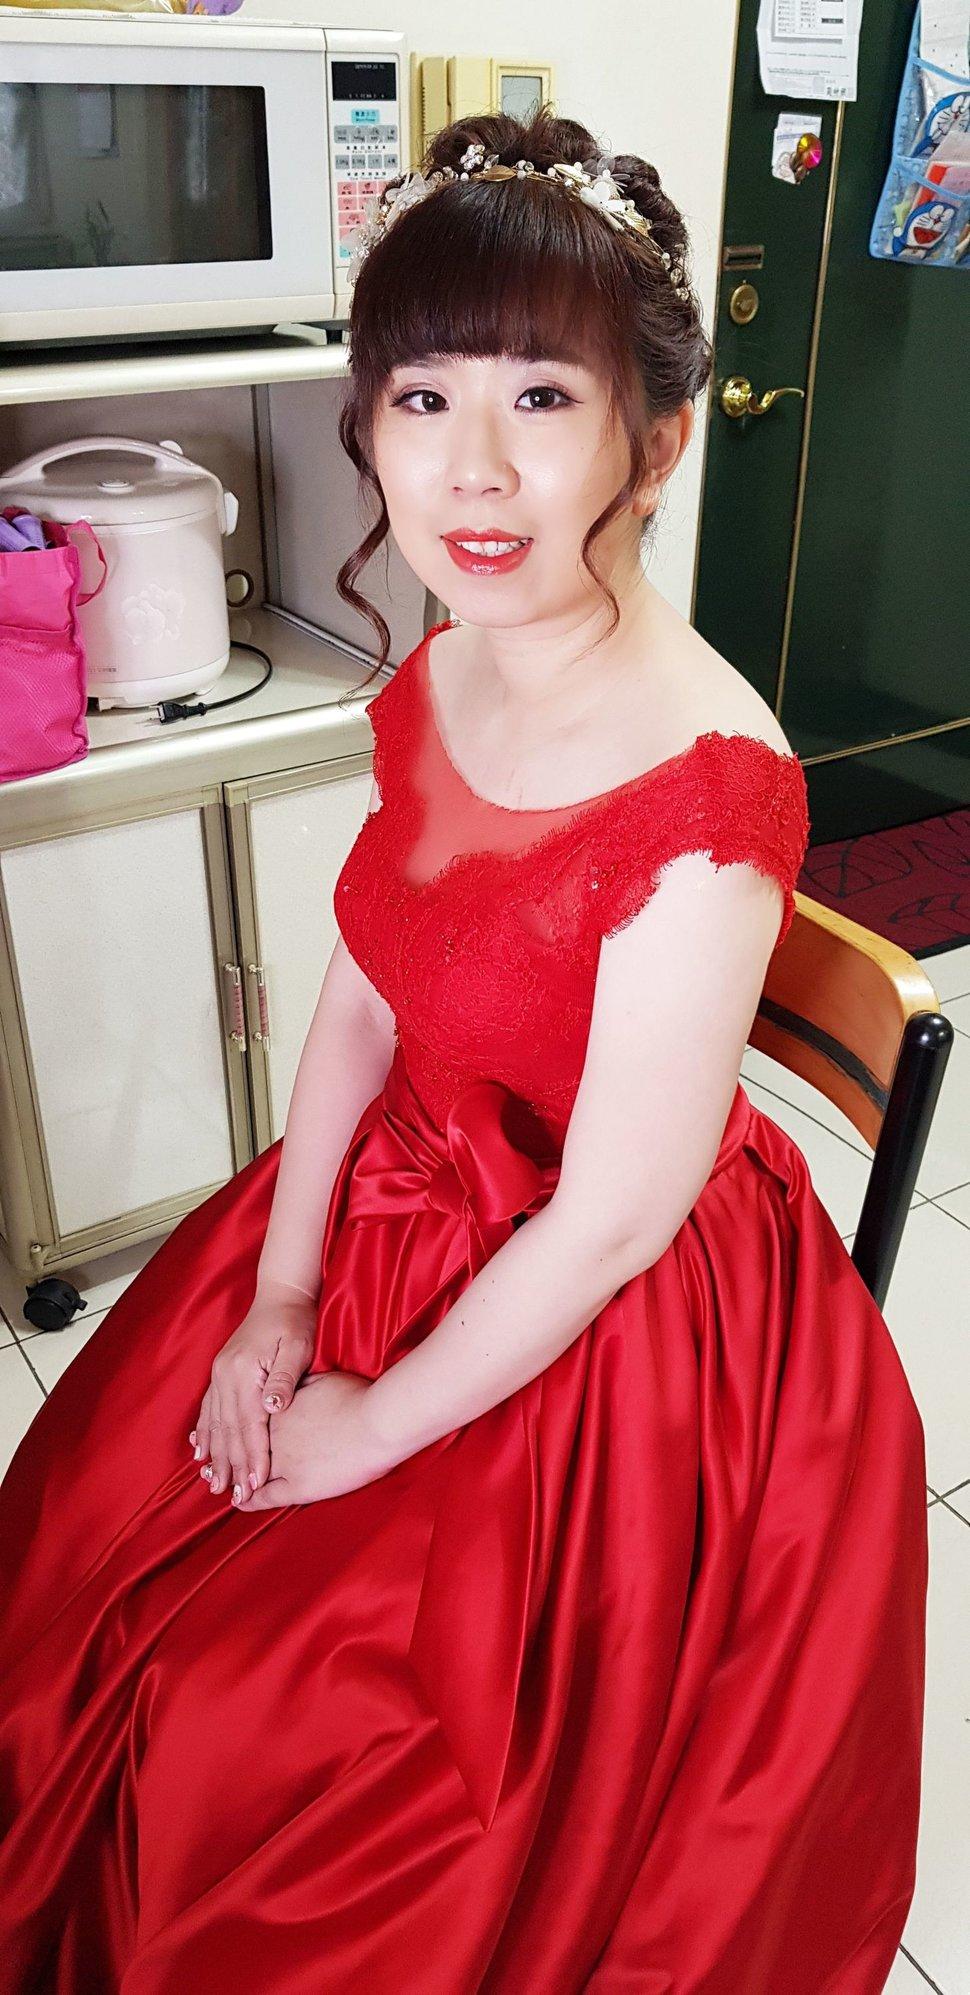 PSFix_20191012_083537 - 漾時尚婚禮整體造型總監蘇蓉蓉《結婚吧》